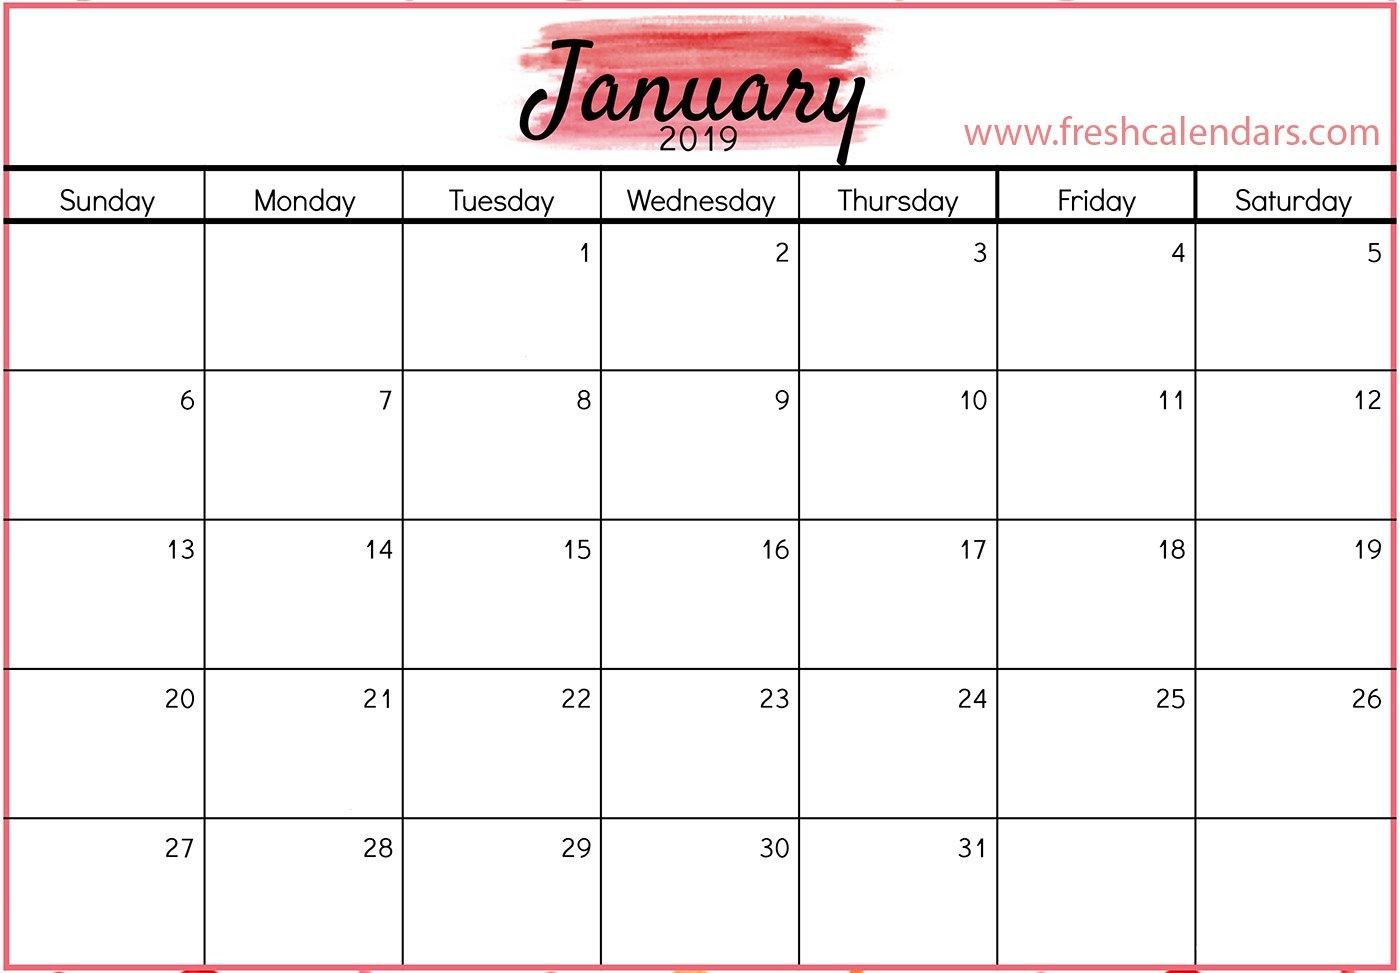 January 2019 Printable Calendars - Fresh Calendars Calendar 2019 11X17